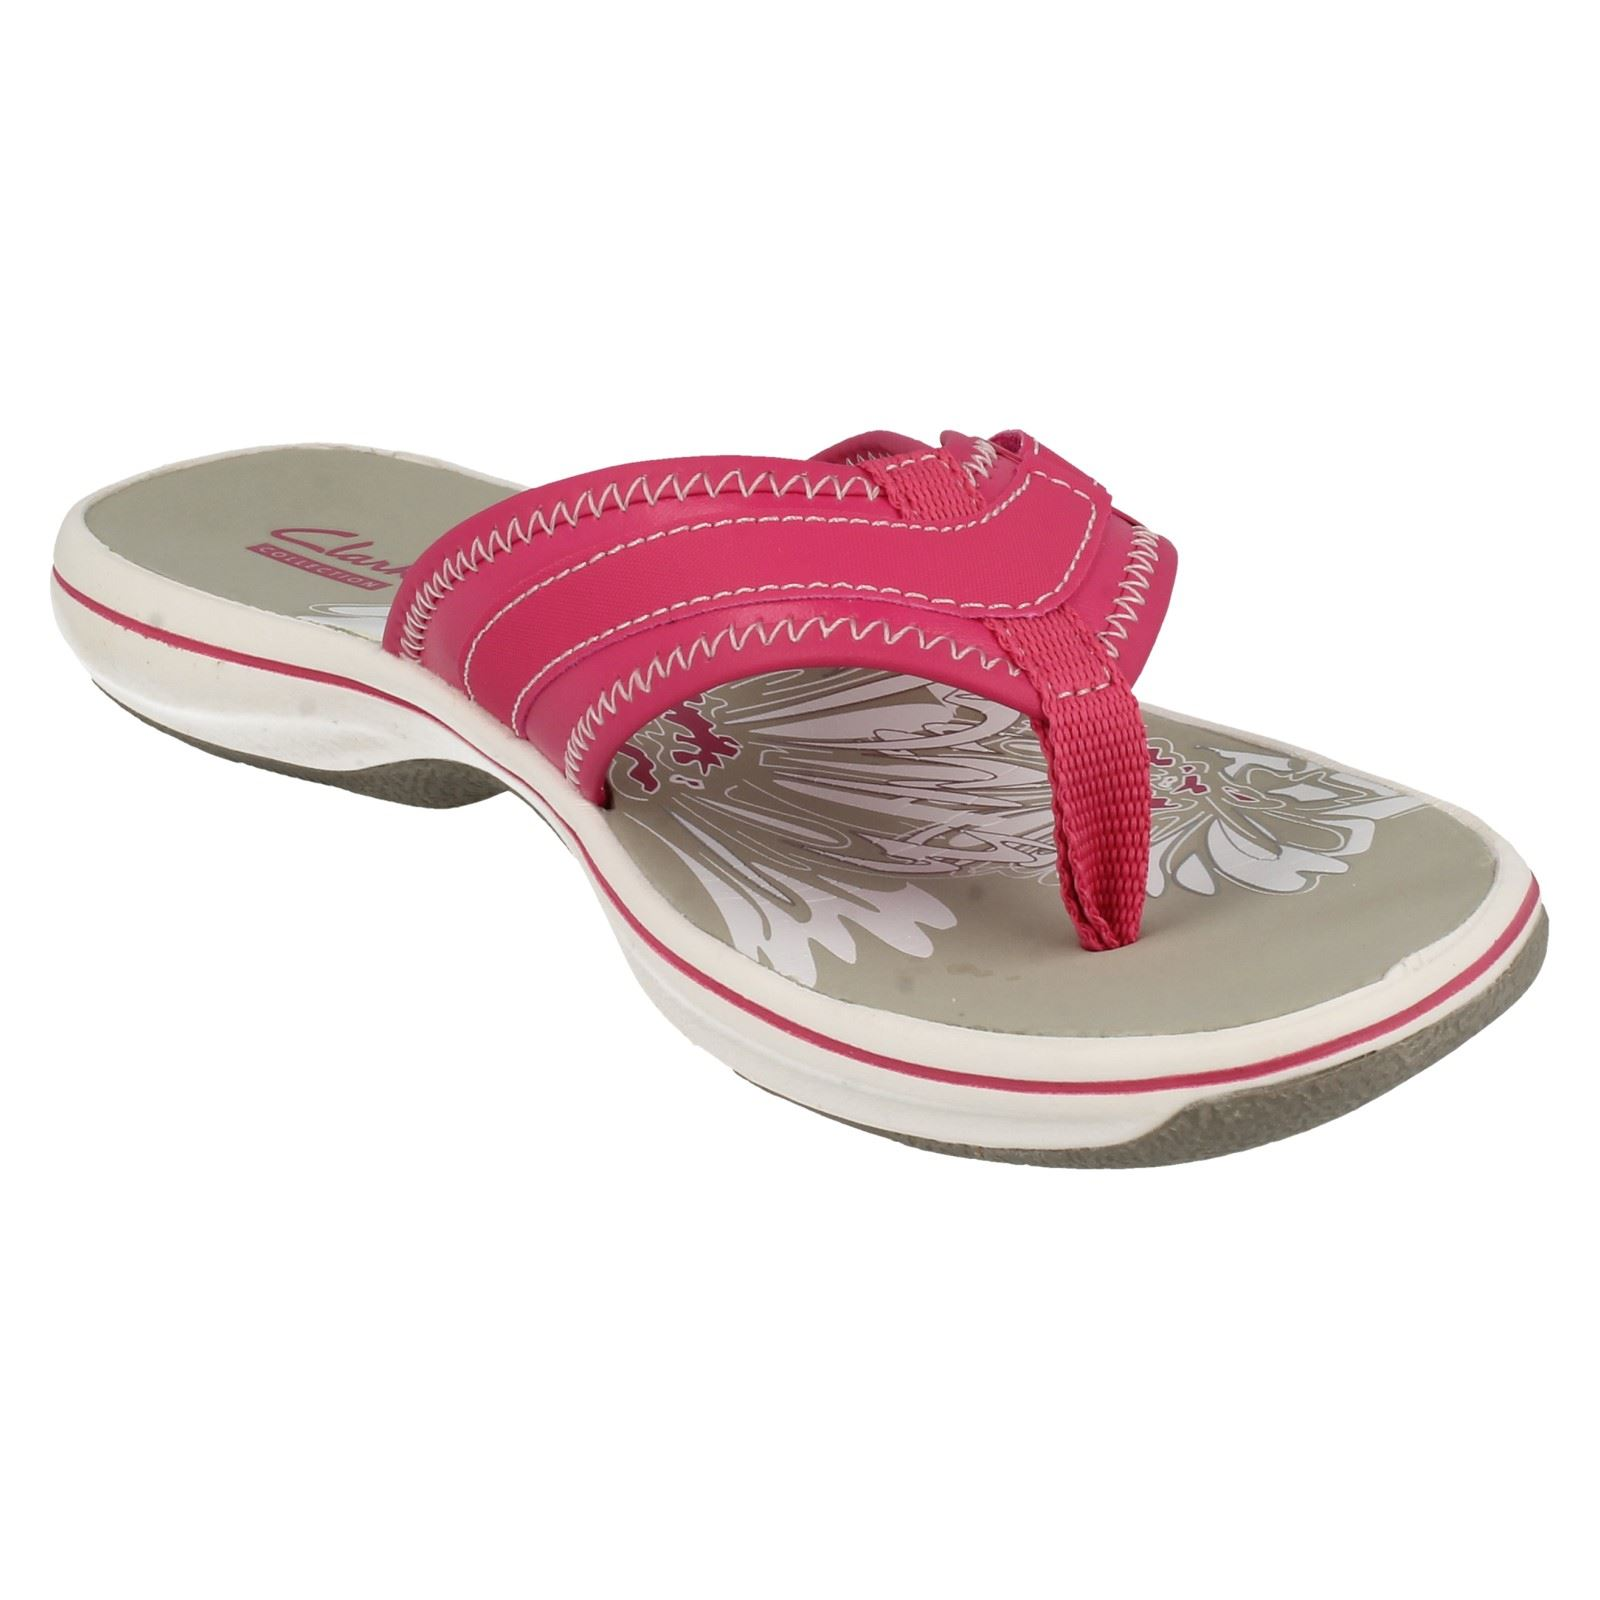 d7e8cfc7c Ladies-Clarks-Brinkley-Mila-Toe-Post-Sandals thumbnail 8